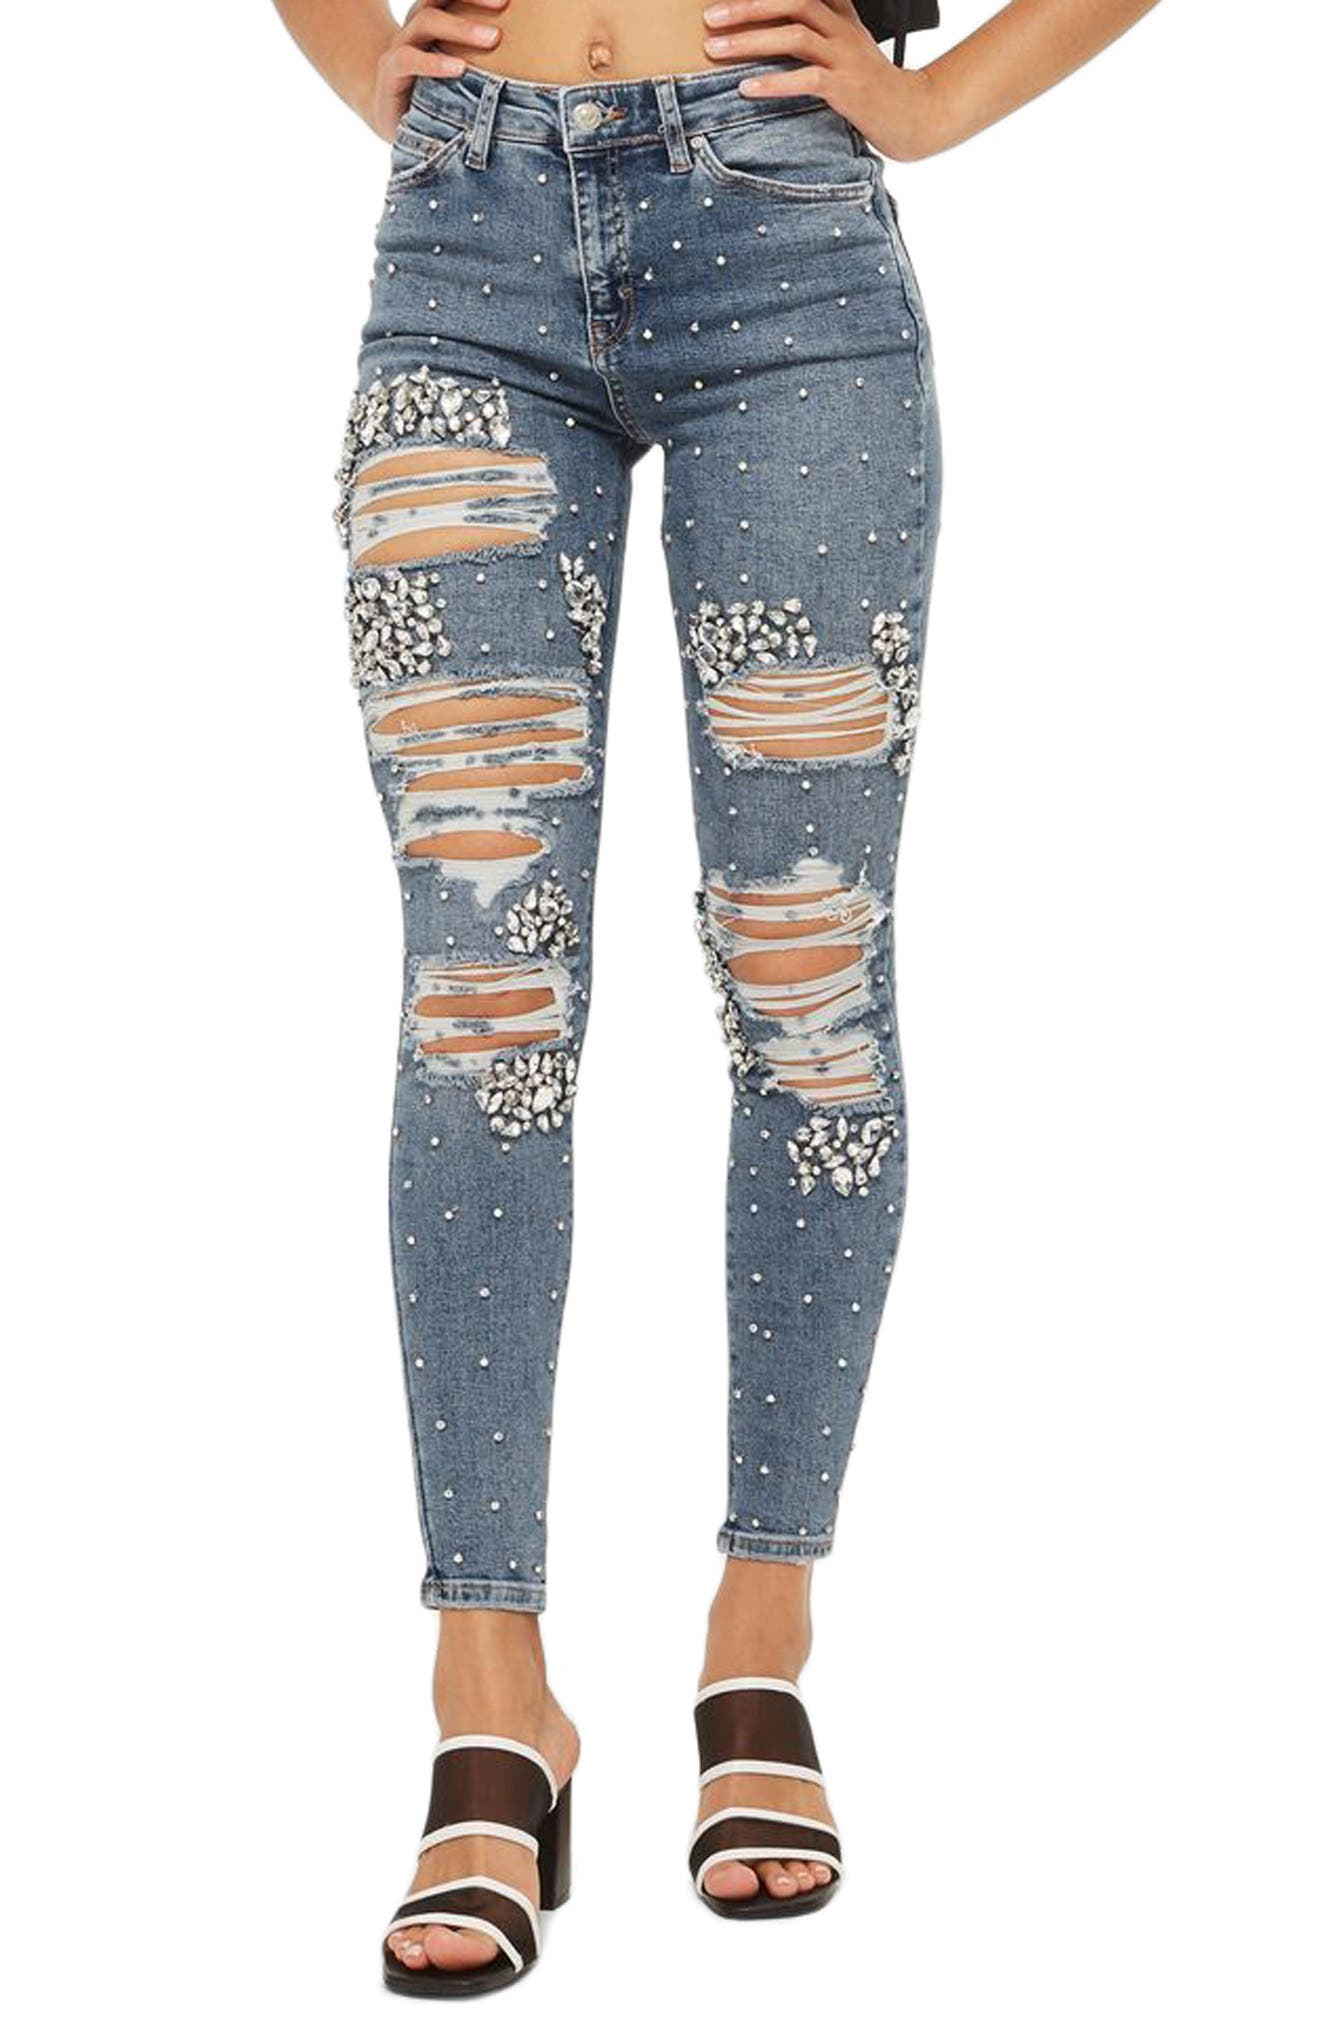 Topshop Limited Edition Jamie Gem Encrusted Skinny Jeans